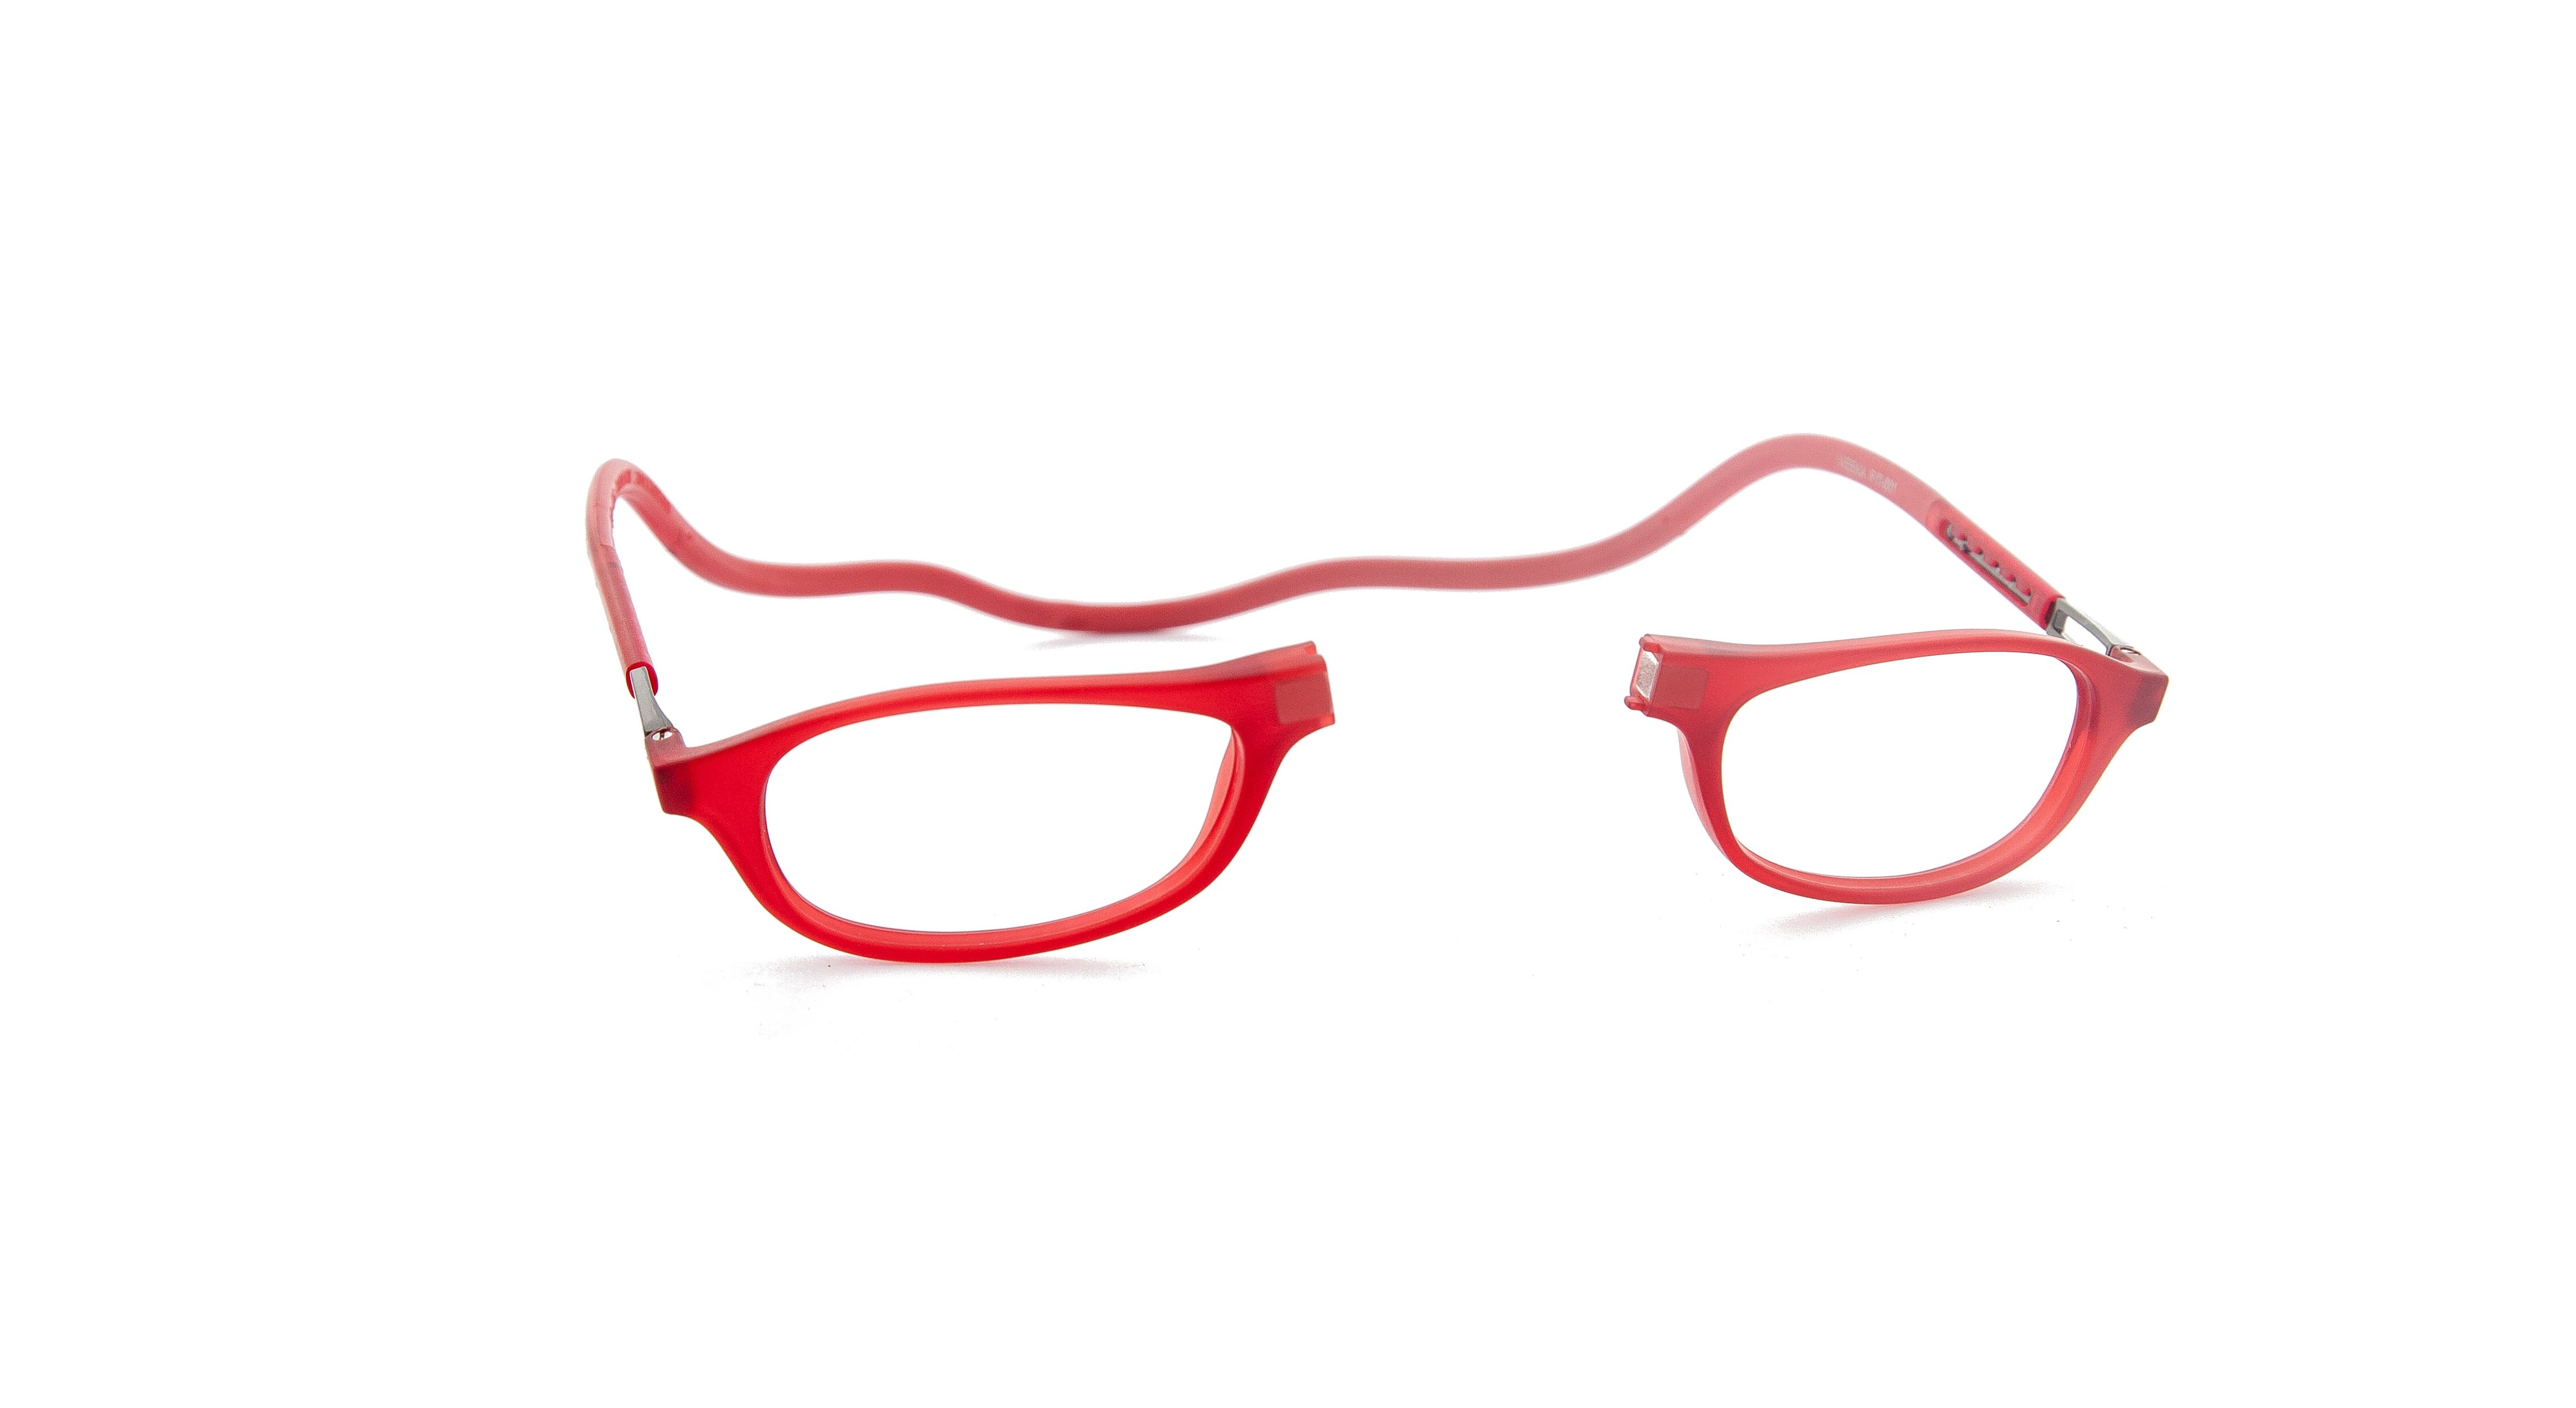 Gafas para vista cansada con conexión frontal magnética y varilla flexible ideal para cabellos largos #gafaslectura #eyewear #headband